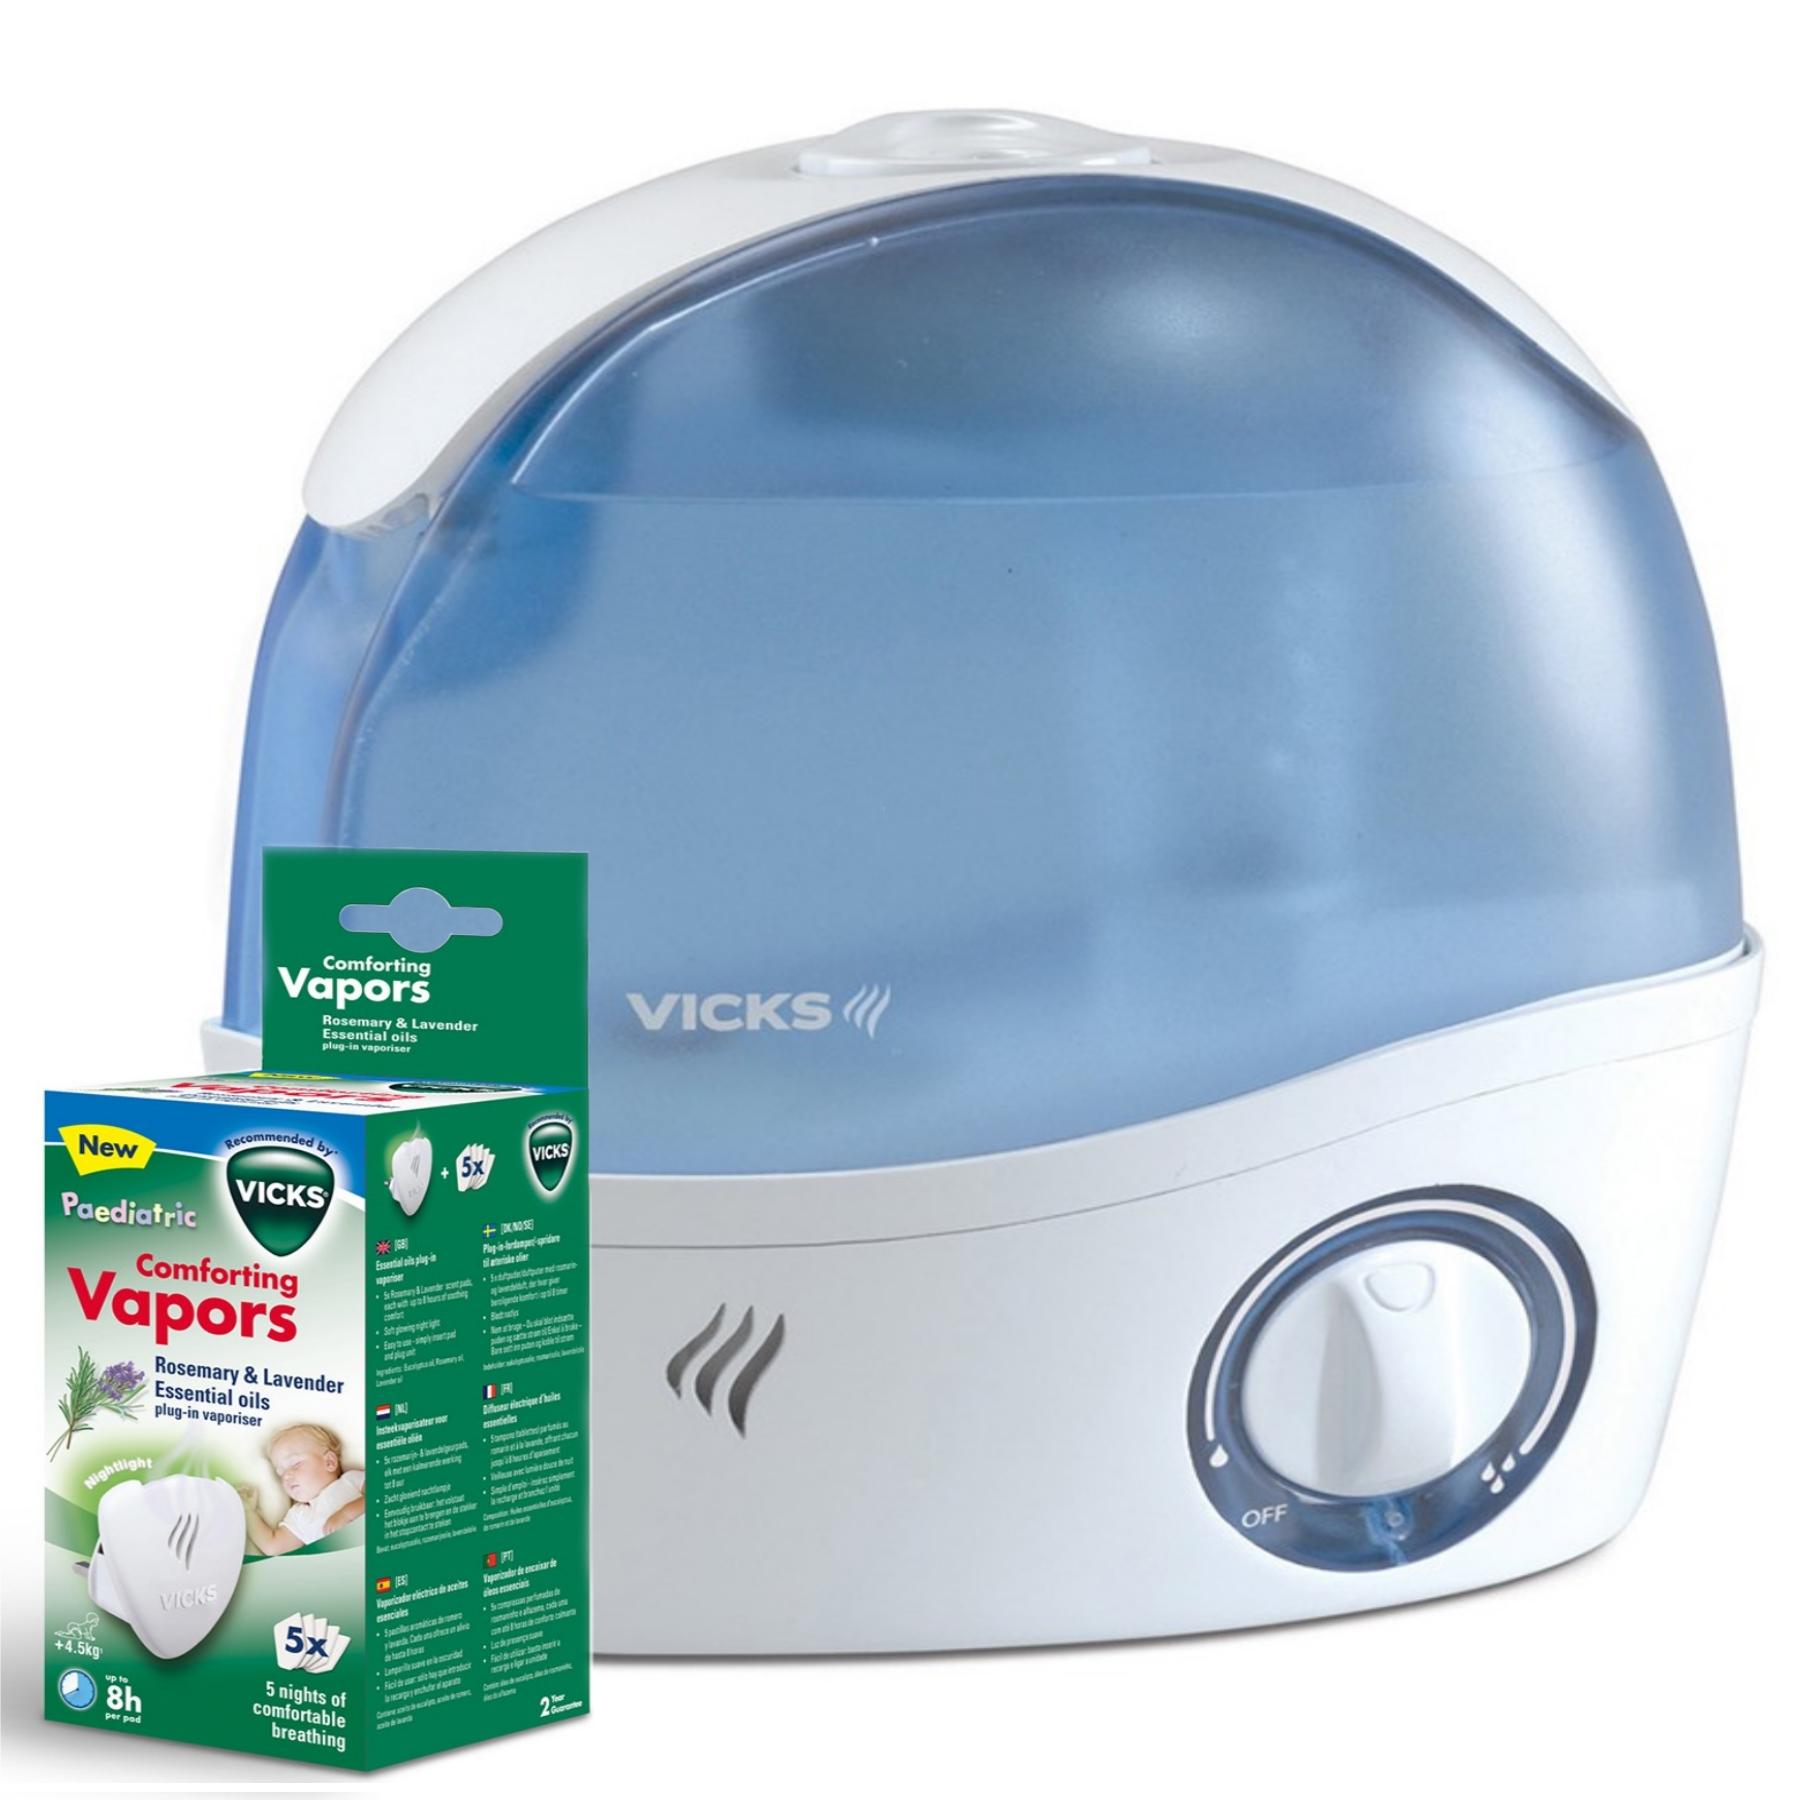 Paediatric Cool Mist Ultrasonic Mini Humidifier With VICVH1700 eBay #01774D